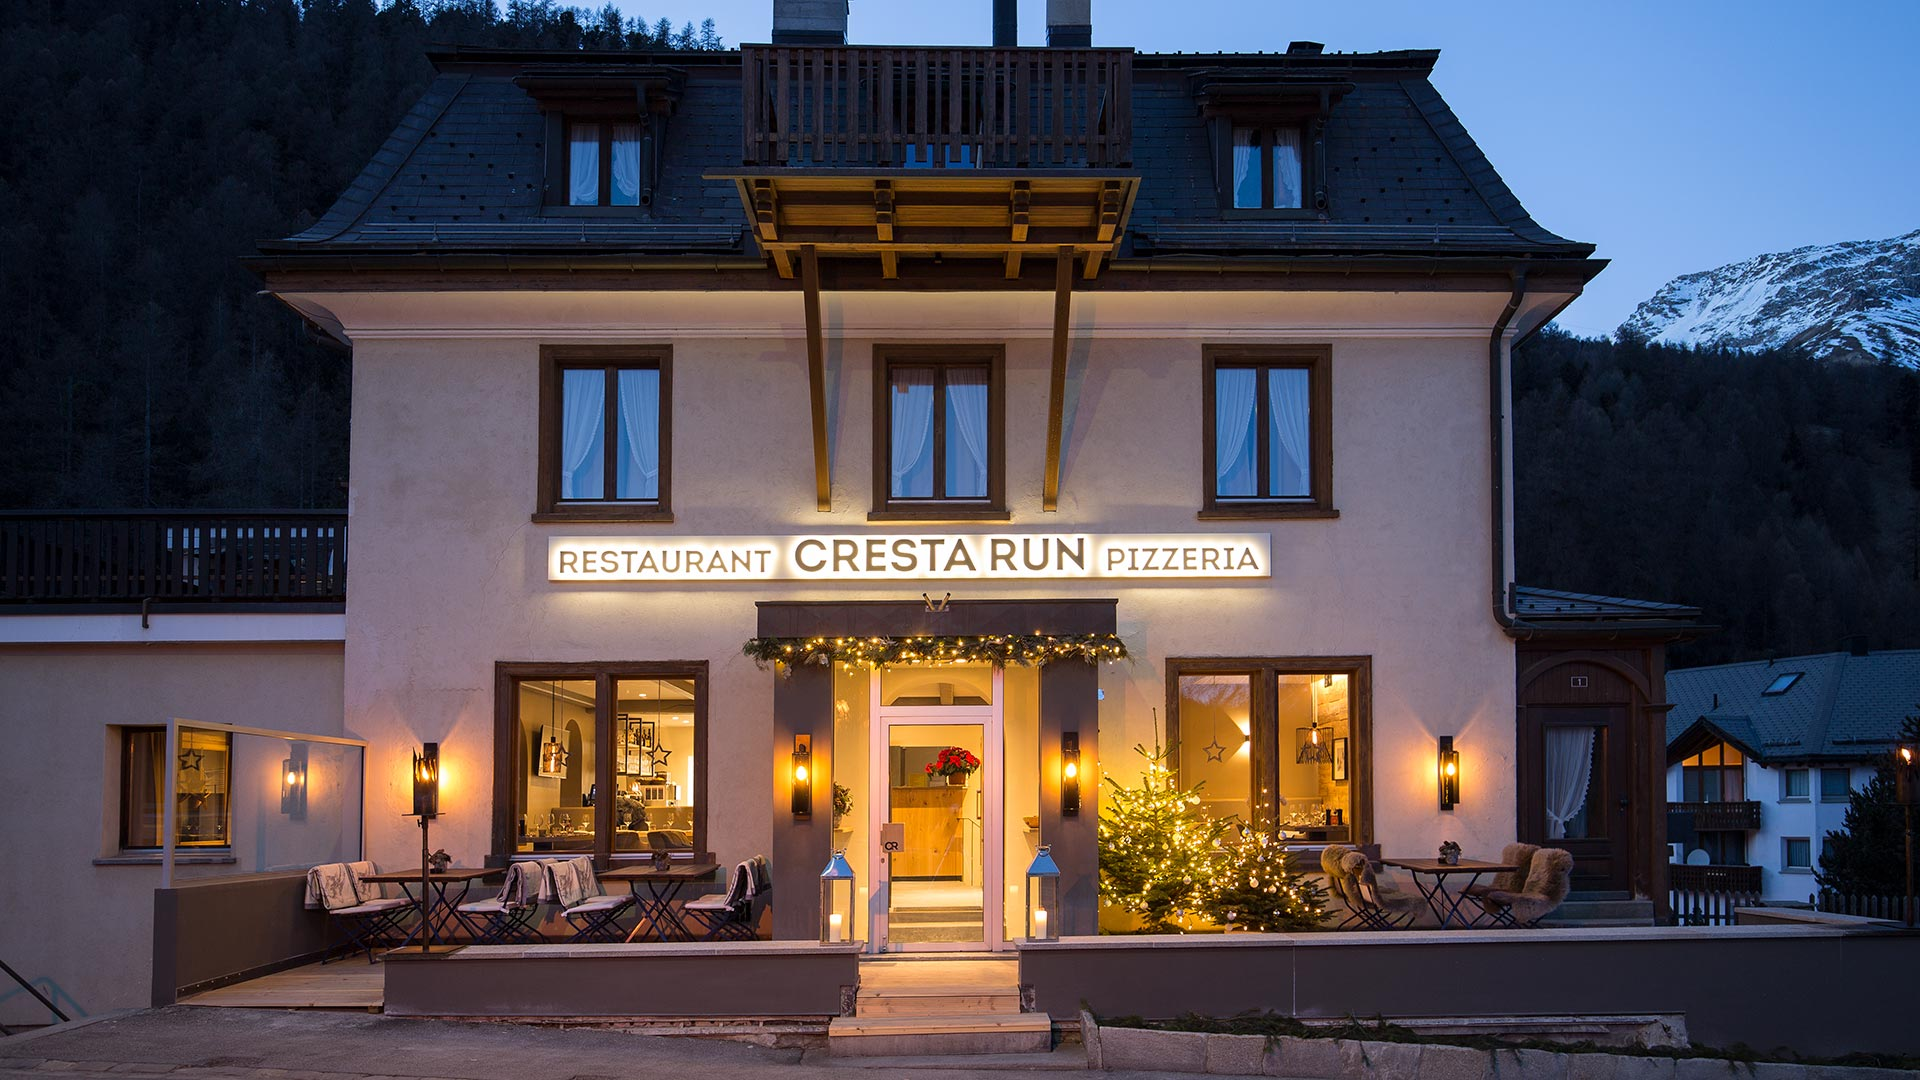 Restaurant Pizzeria Cresta Run Slide 2